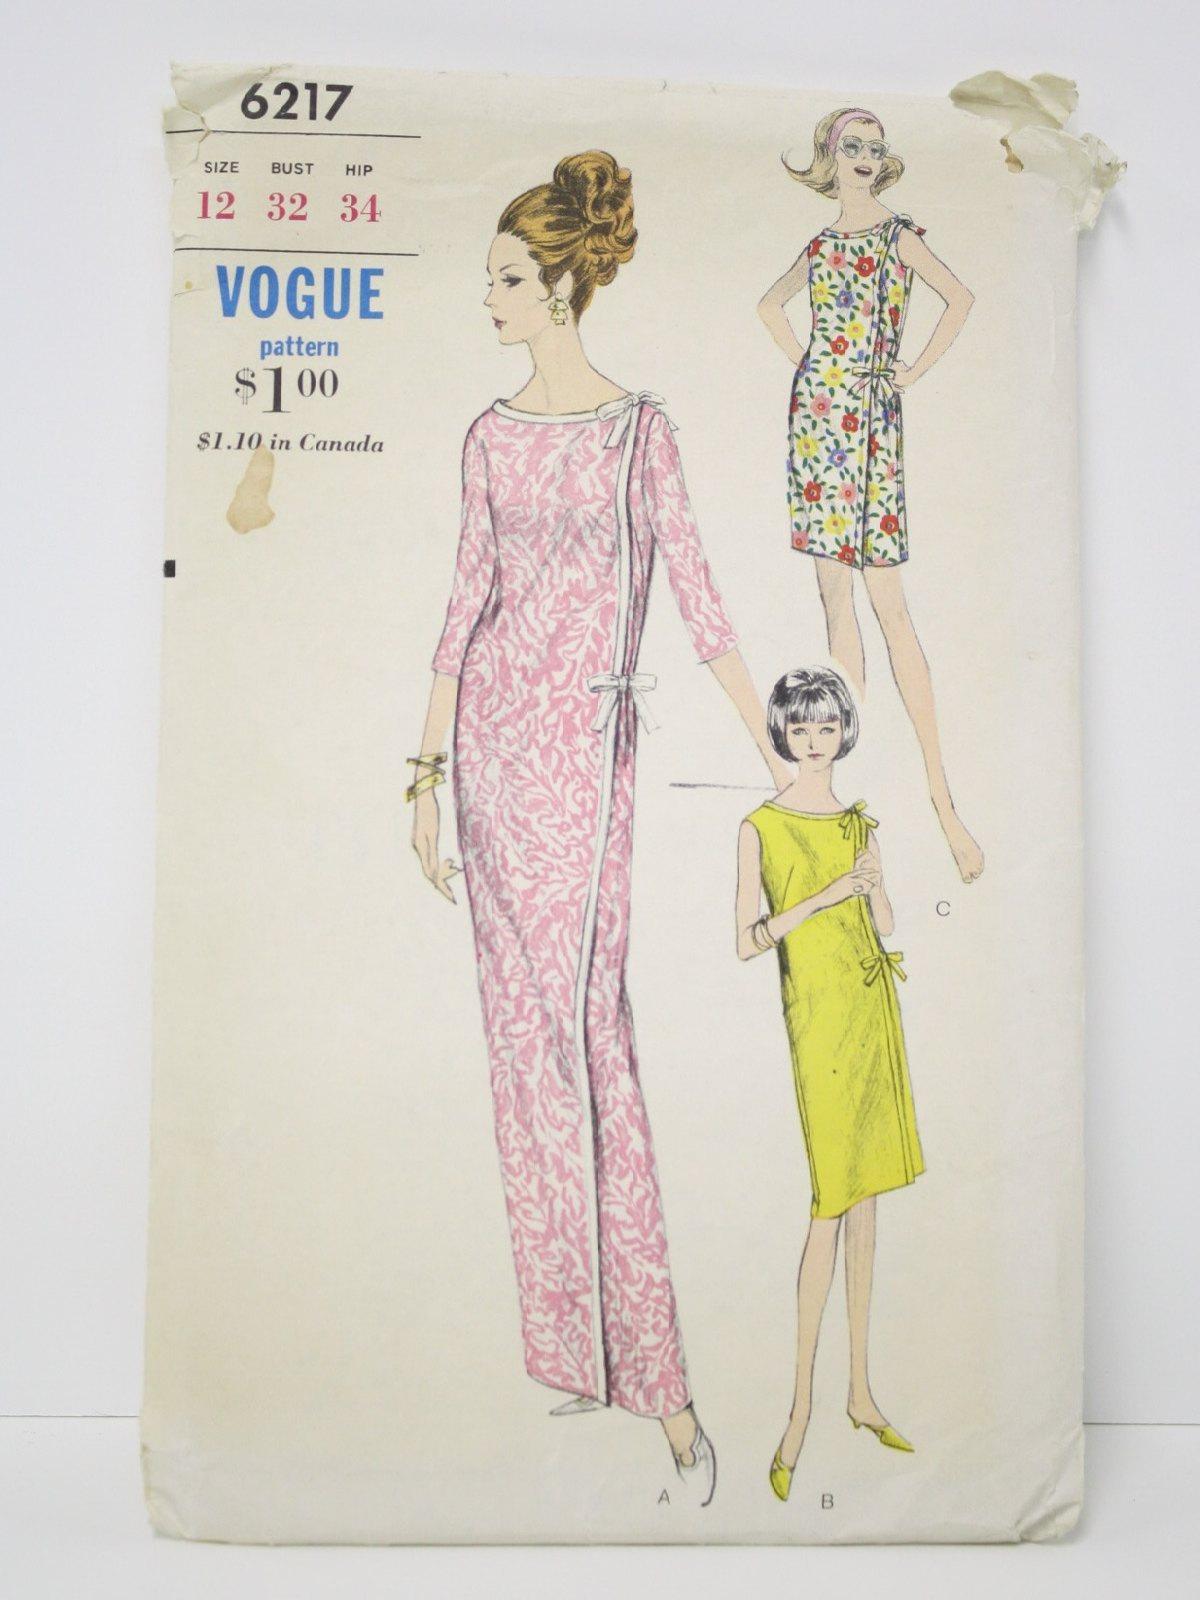 60s Retro Sewing Pattern C 1966 Vogue Pattern No 6217